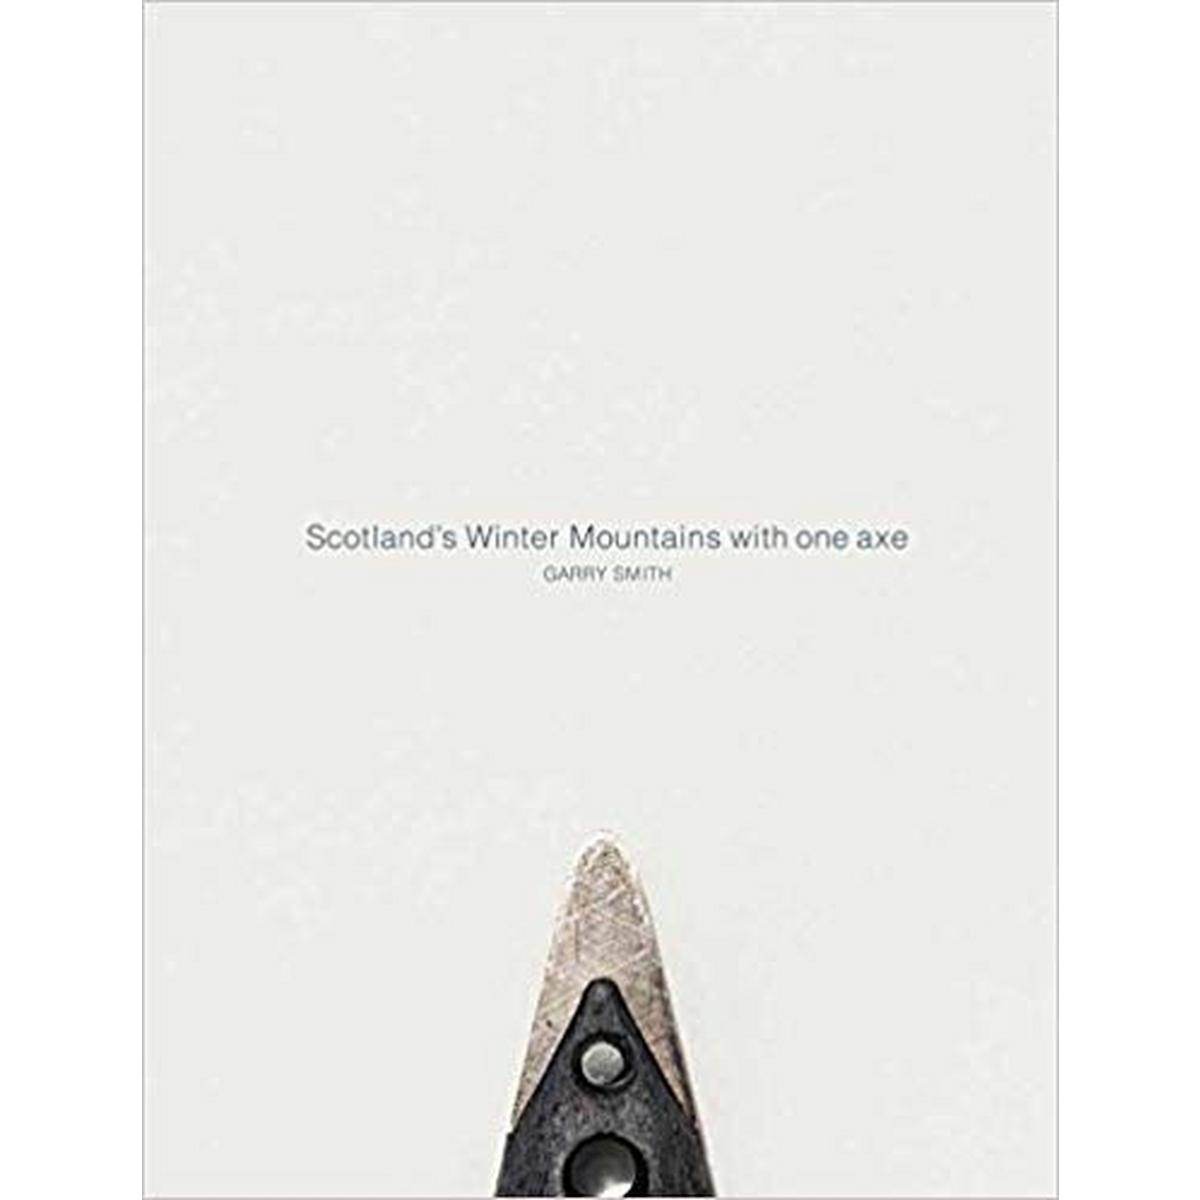 Cordee Scotland's Winter Mountains by Gary Smith